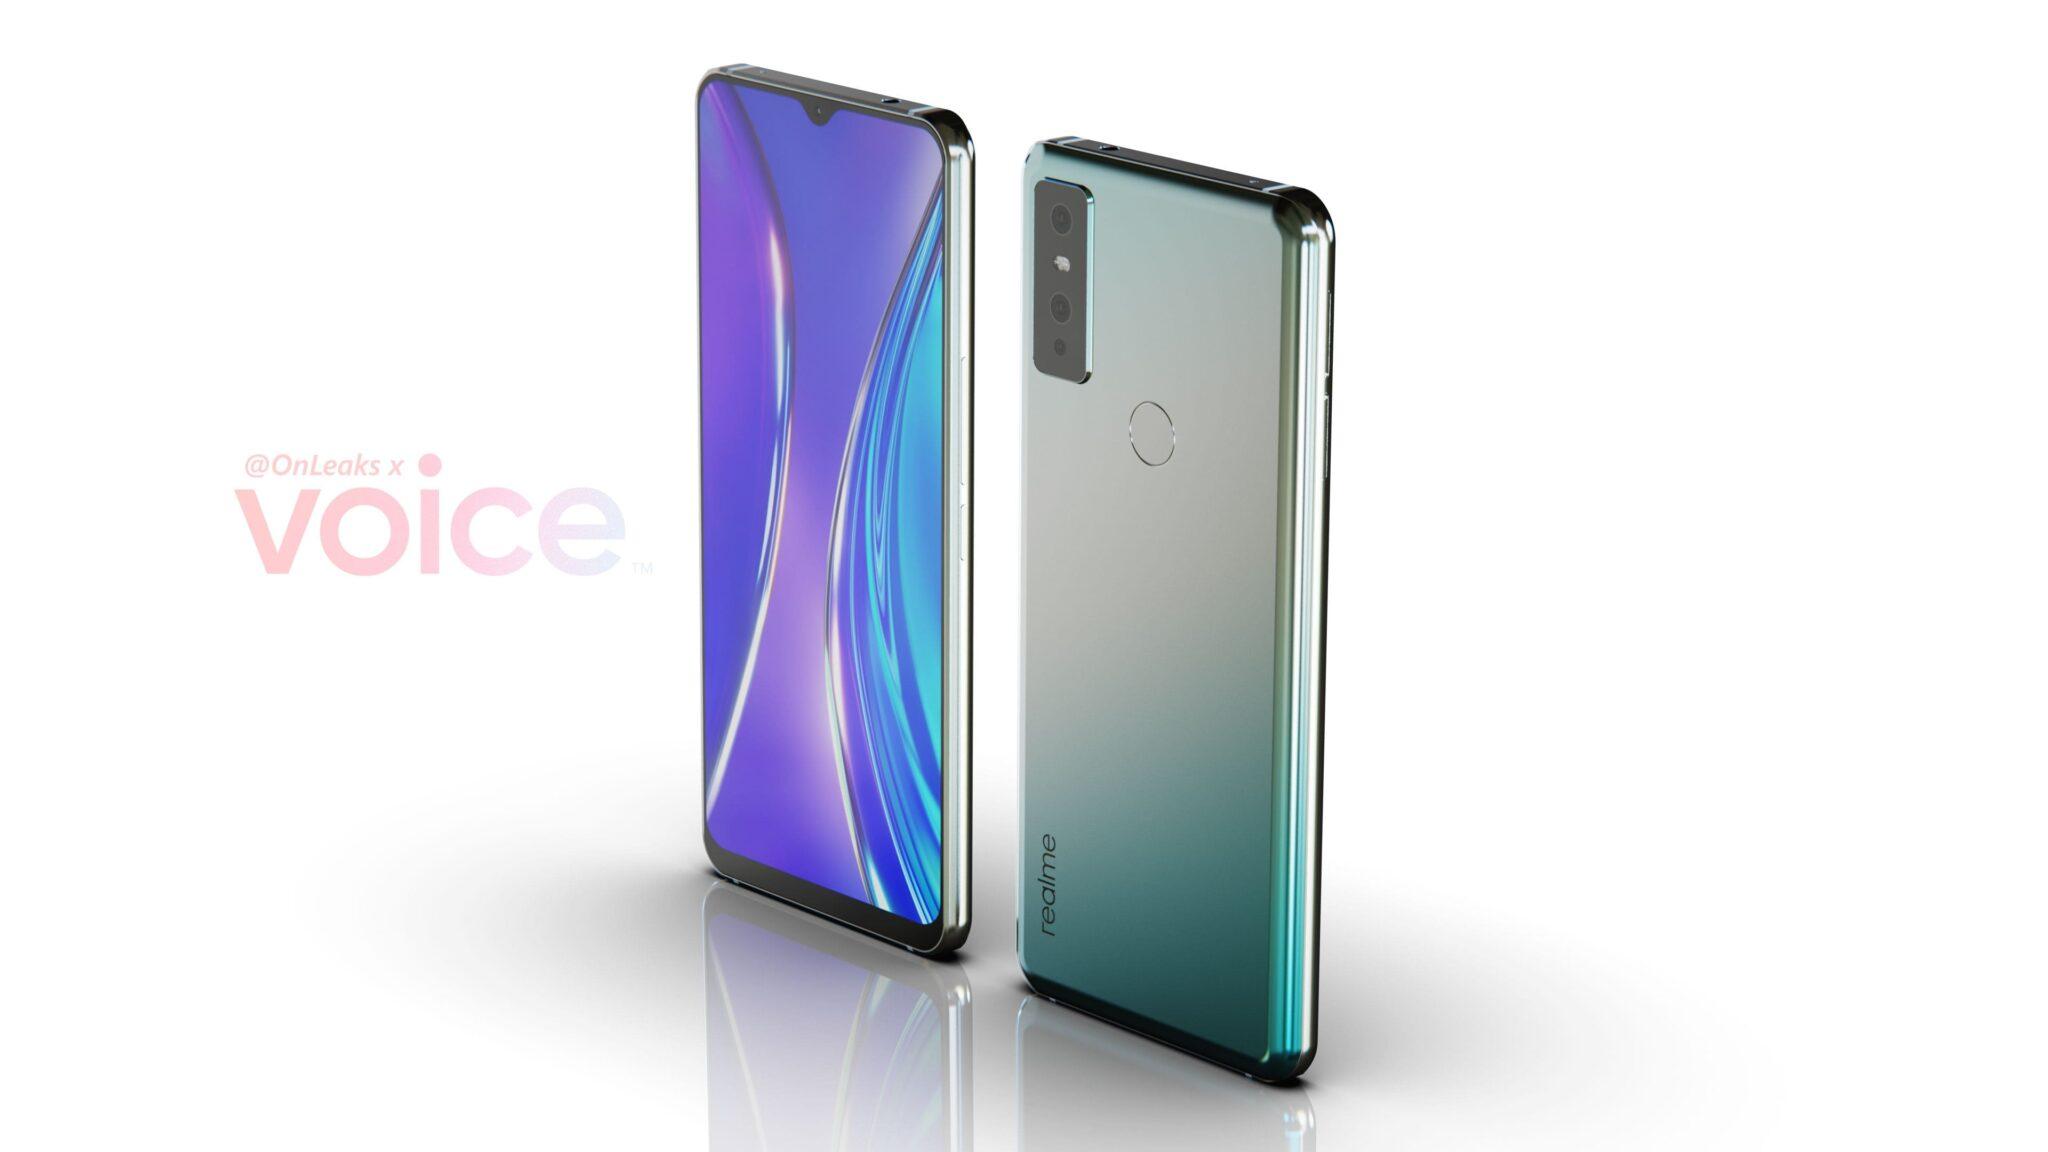 lateral-render-3D-smartphone-Realme-marzo-2021